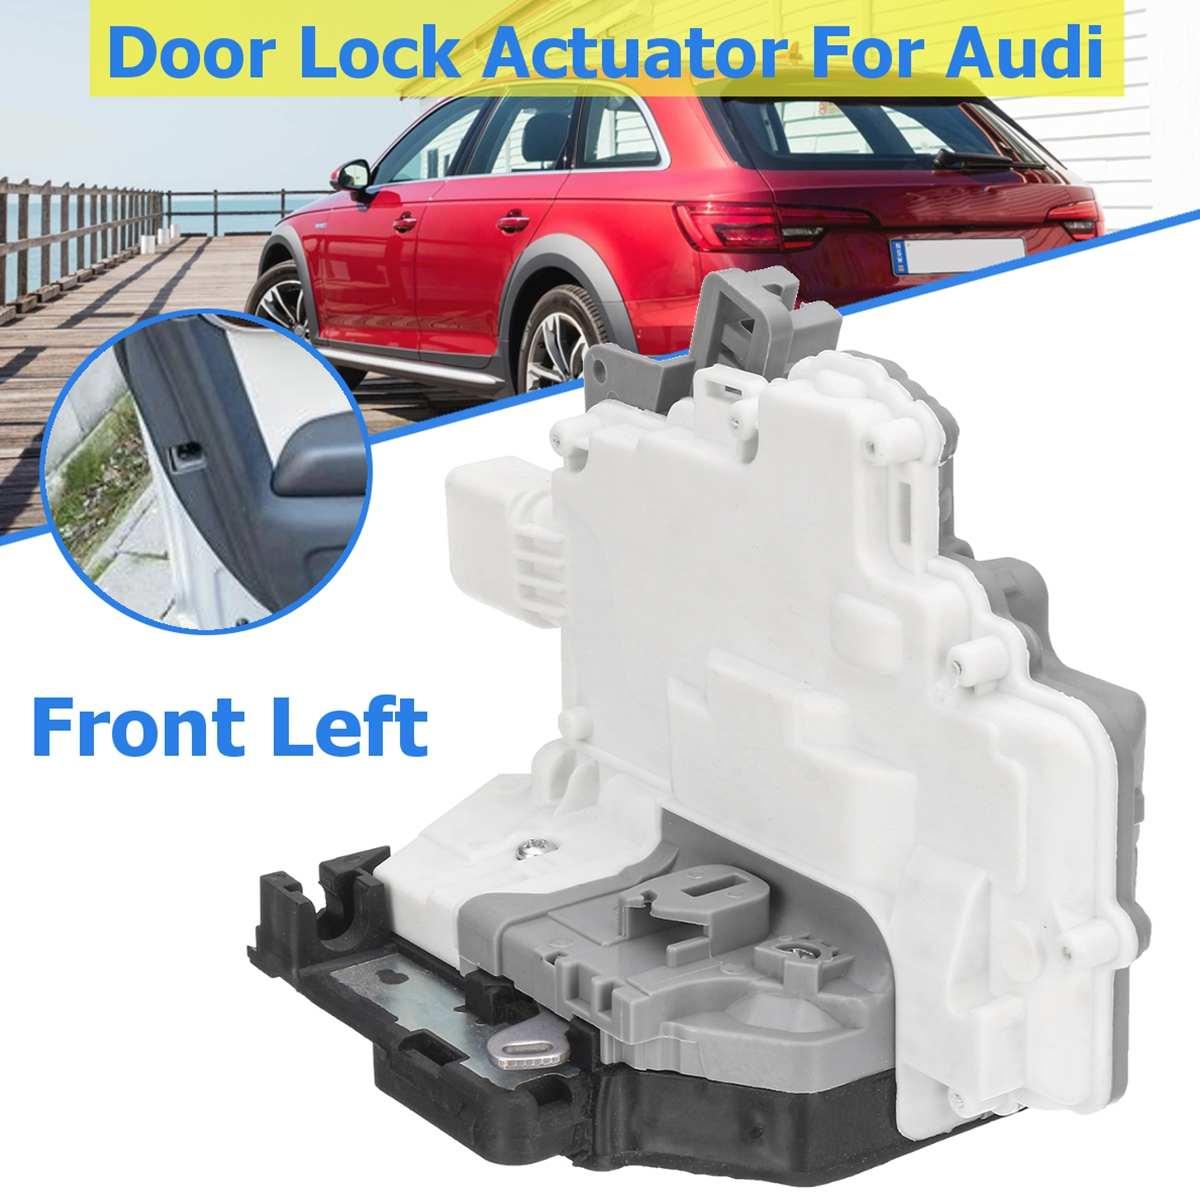 Для Vw для Audi q3 q5 q7 A4 B8 b6 для Skoda Superb Seat Ibiza левый и правый Дверные замки Привод 8K0839016 3C4839016A 8J2837015A